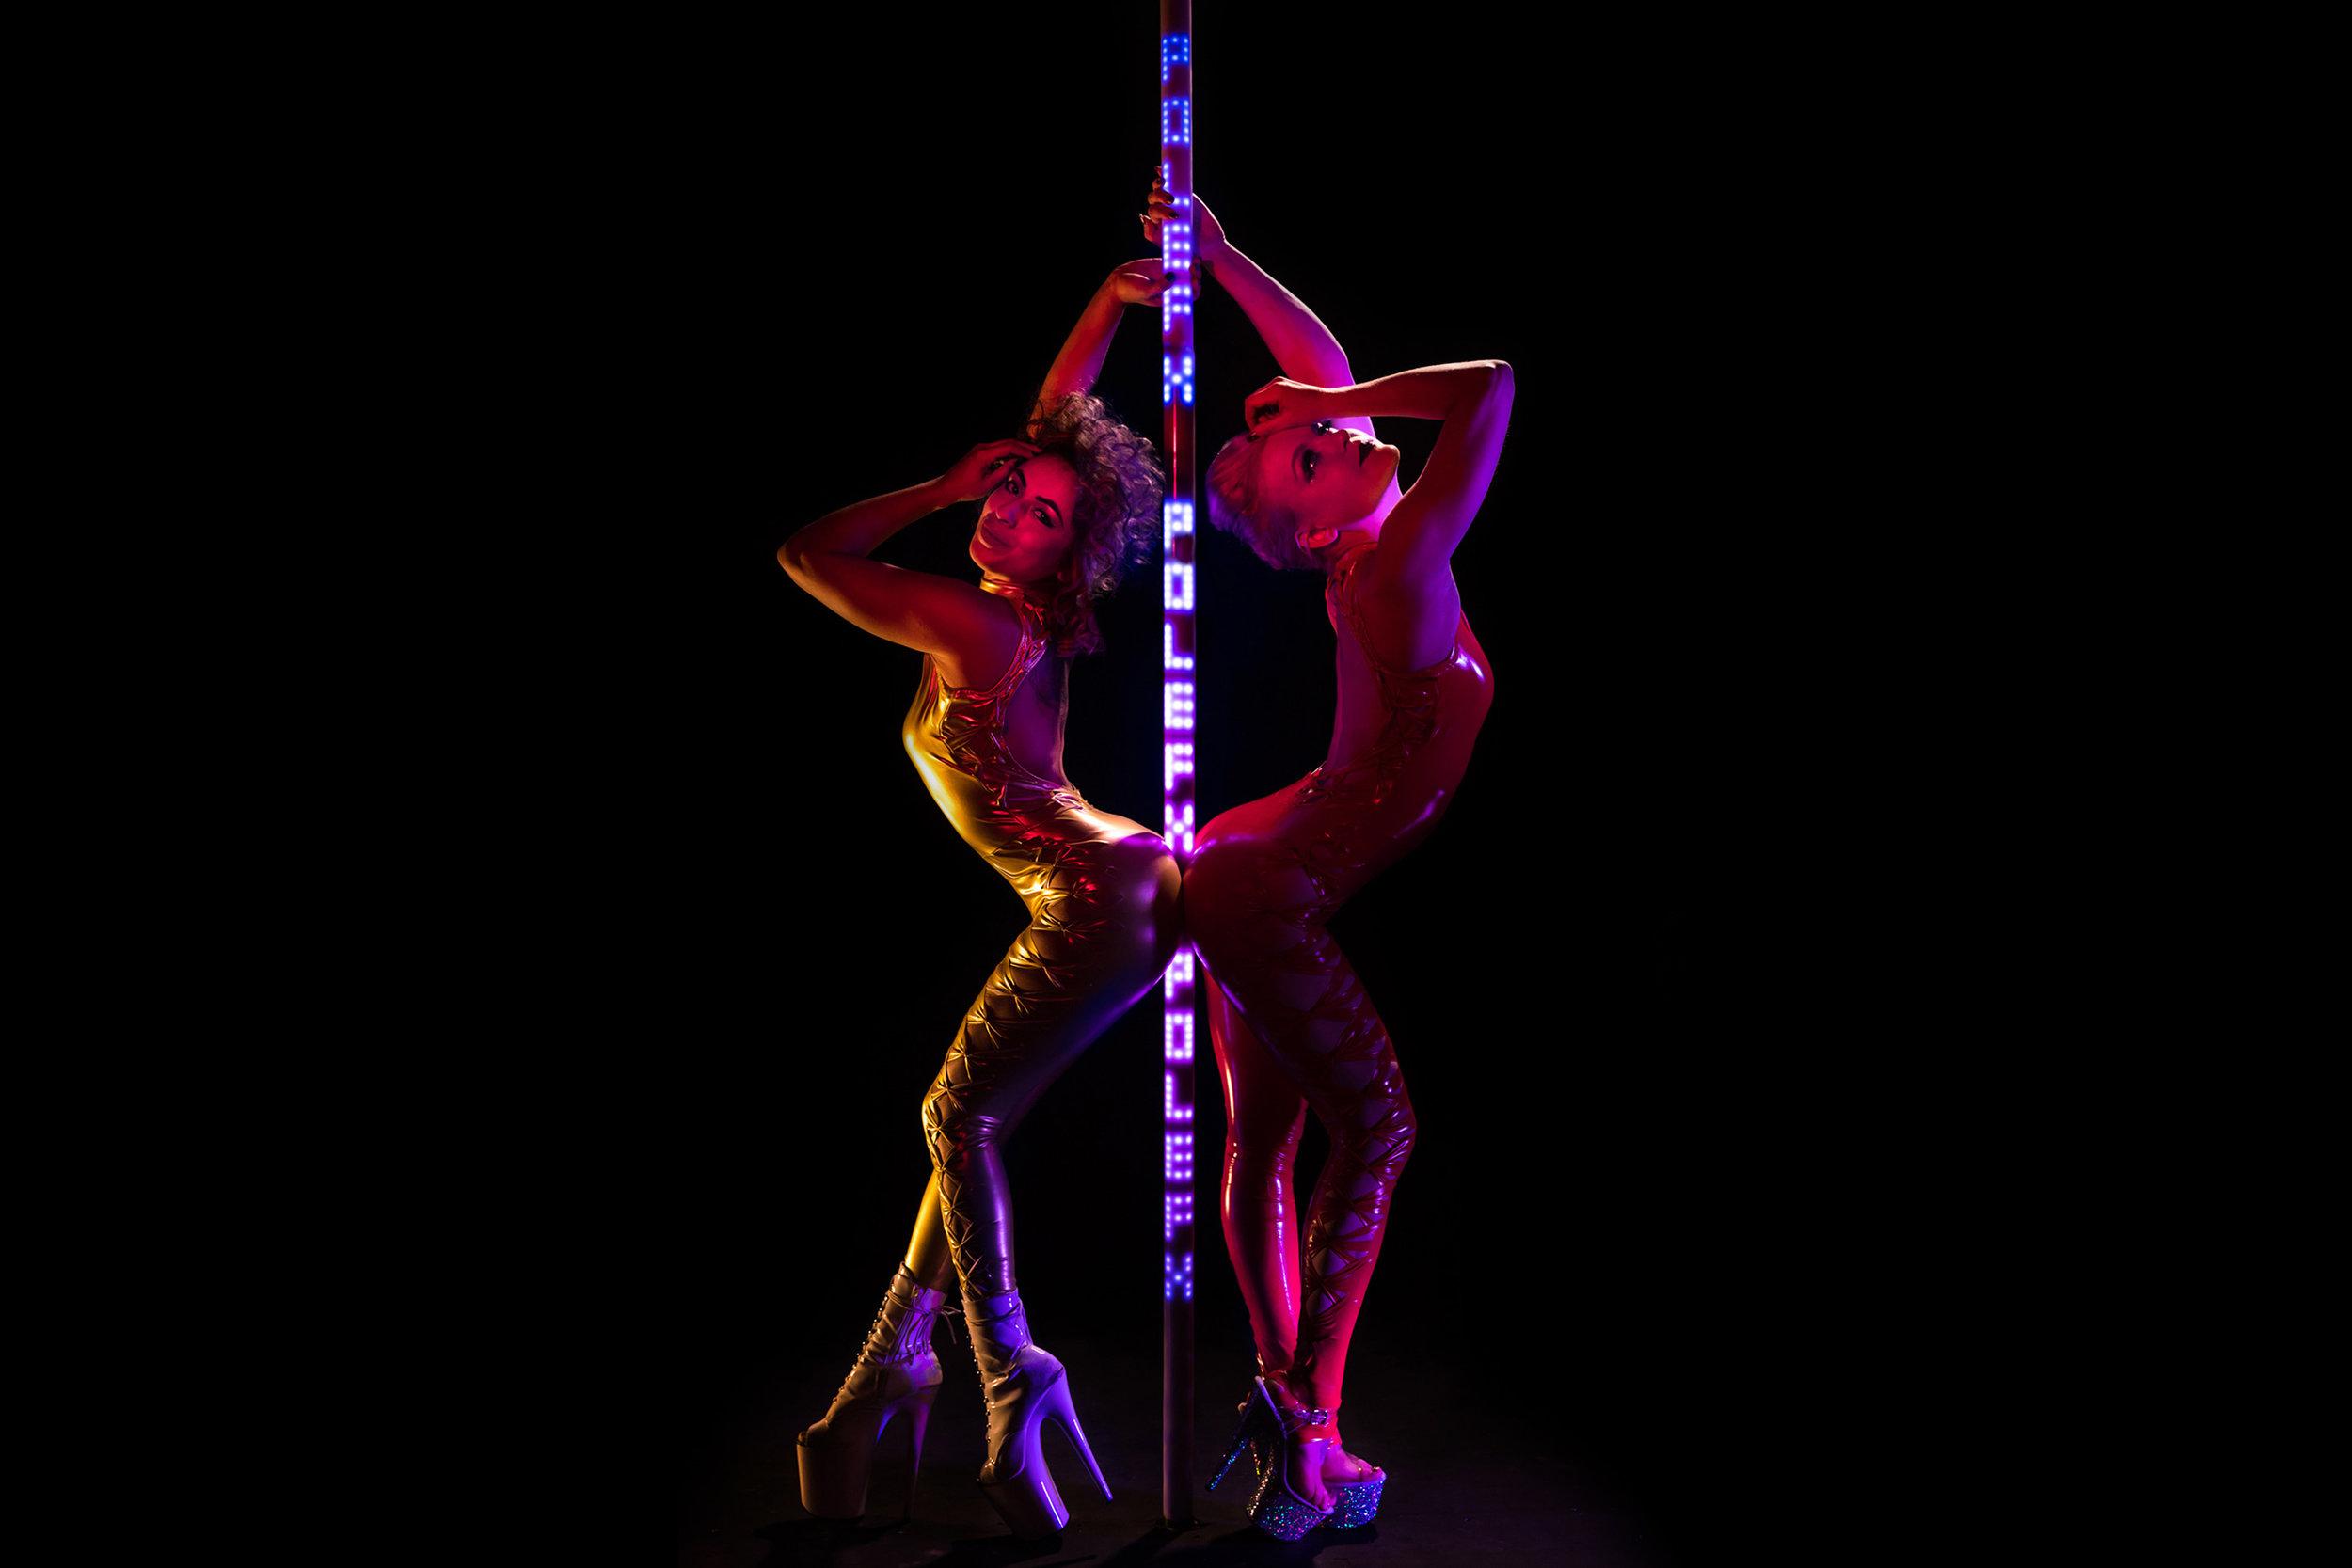 PoleFX LED Dance Pole 17